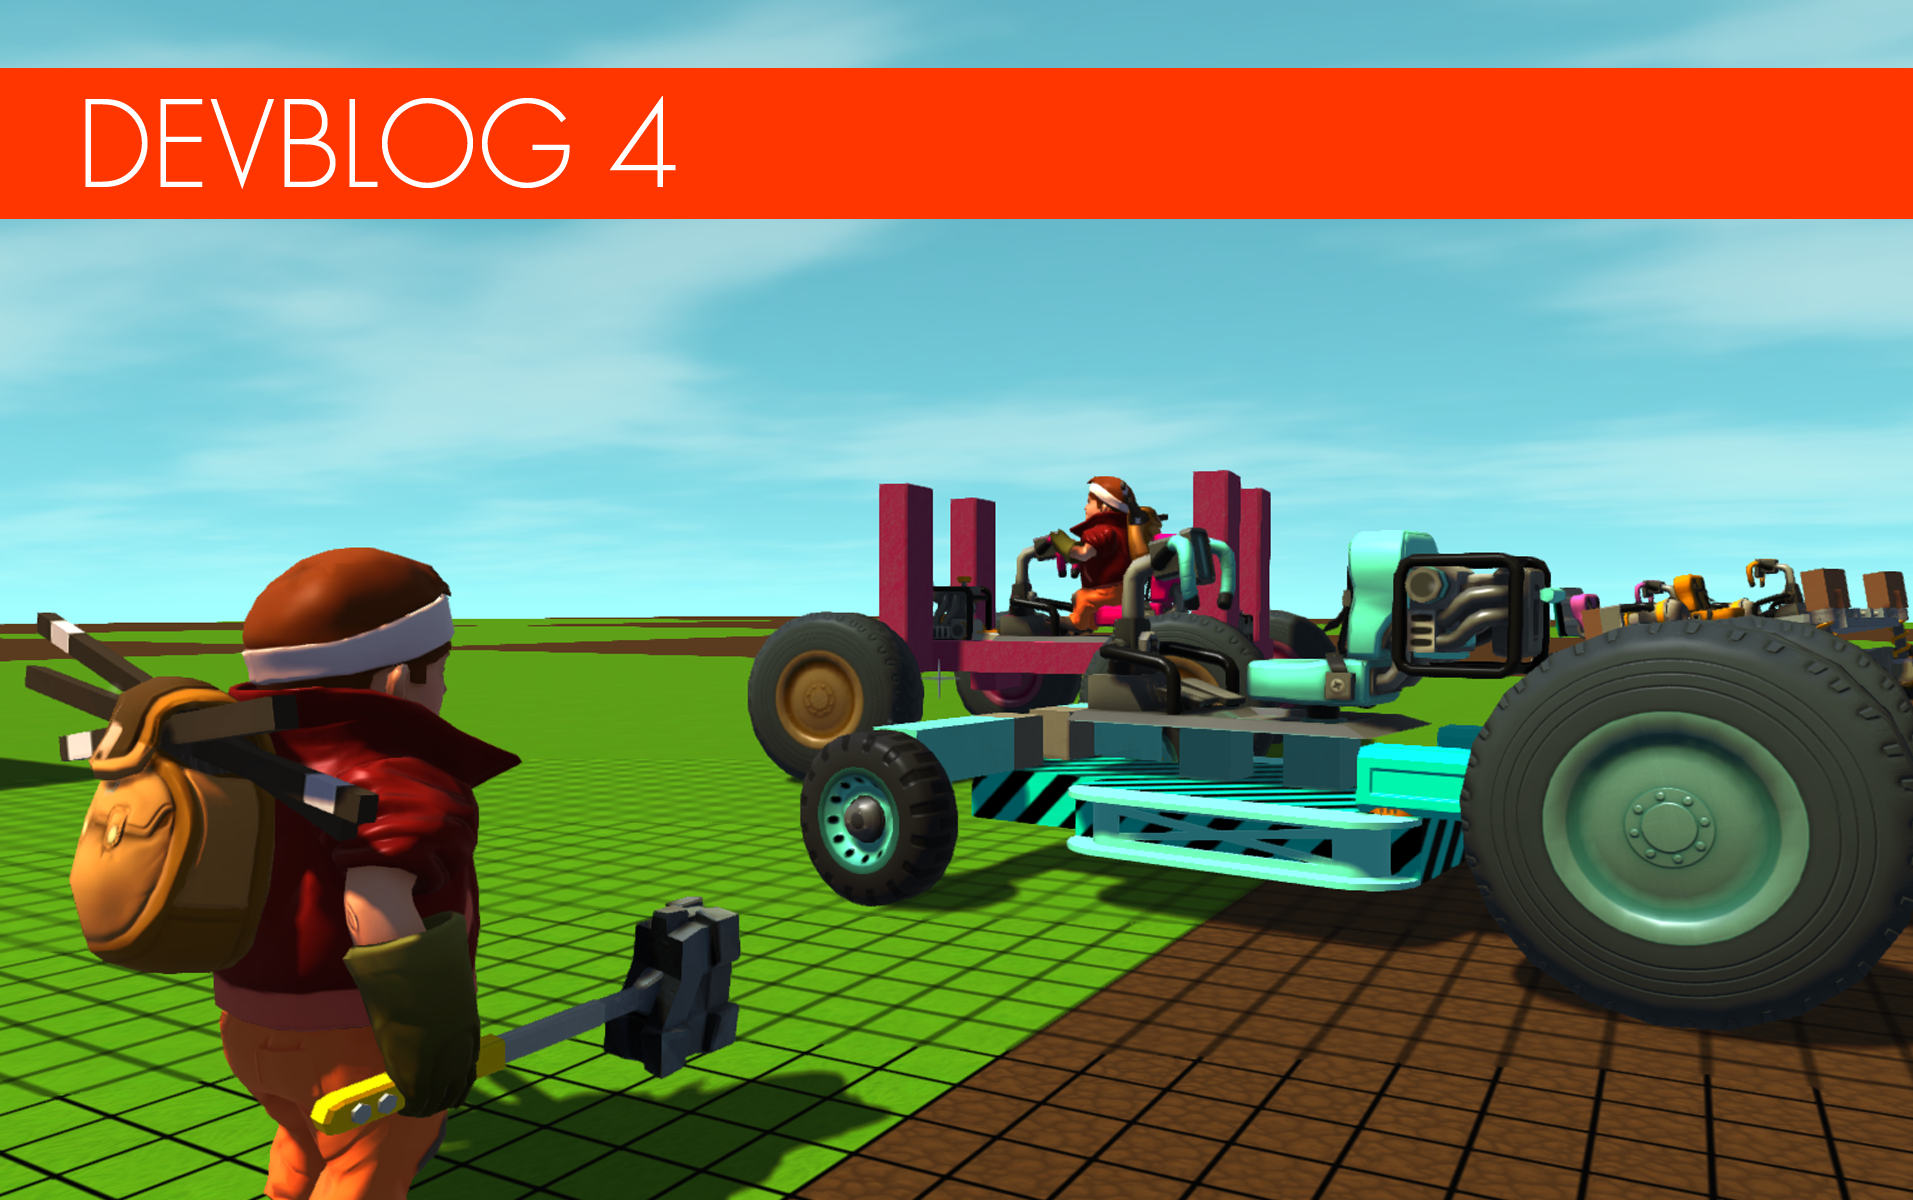 Scrap Mechanic | Read about our latest progress!